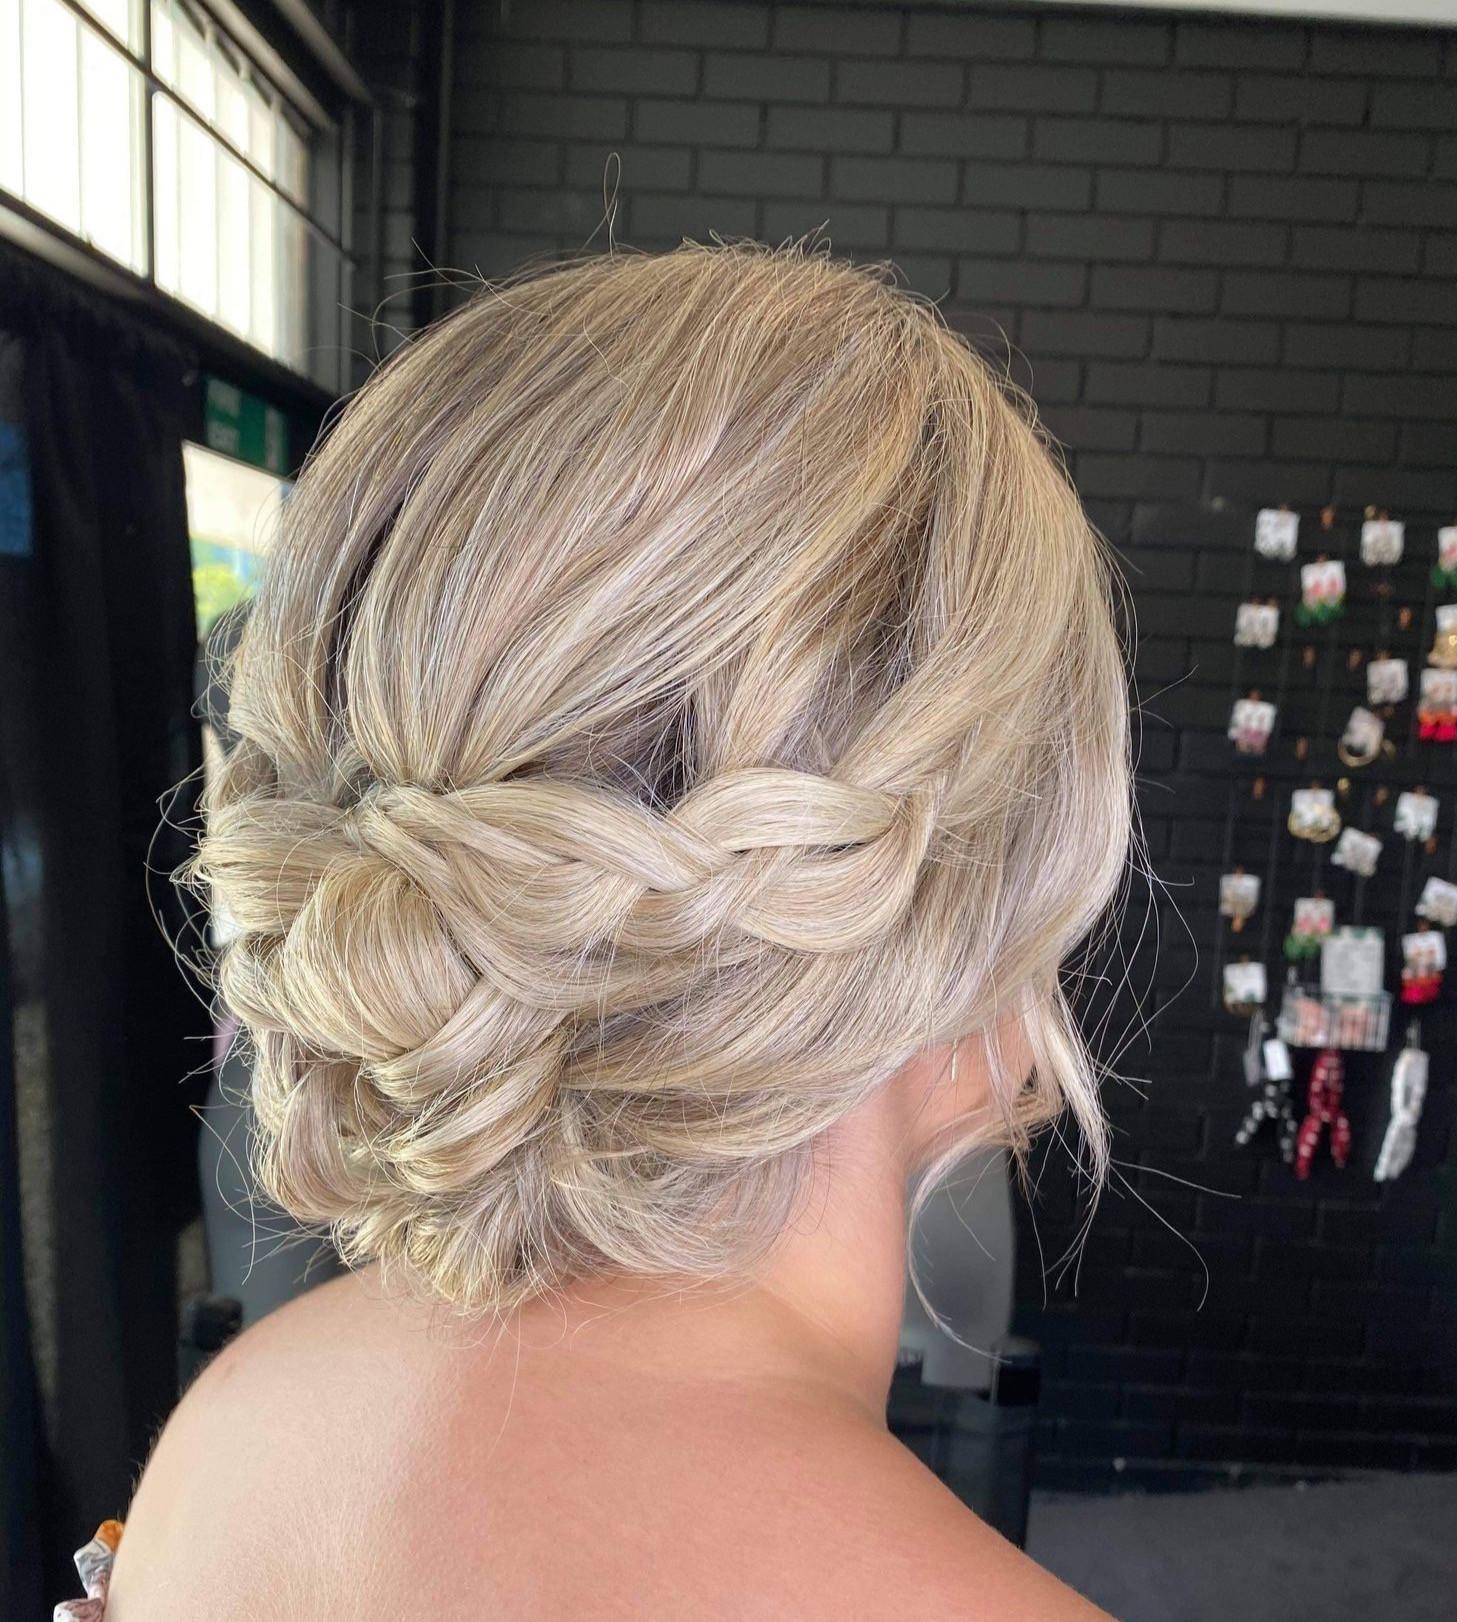 Hair Upstyle